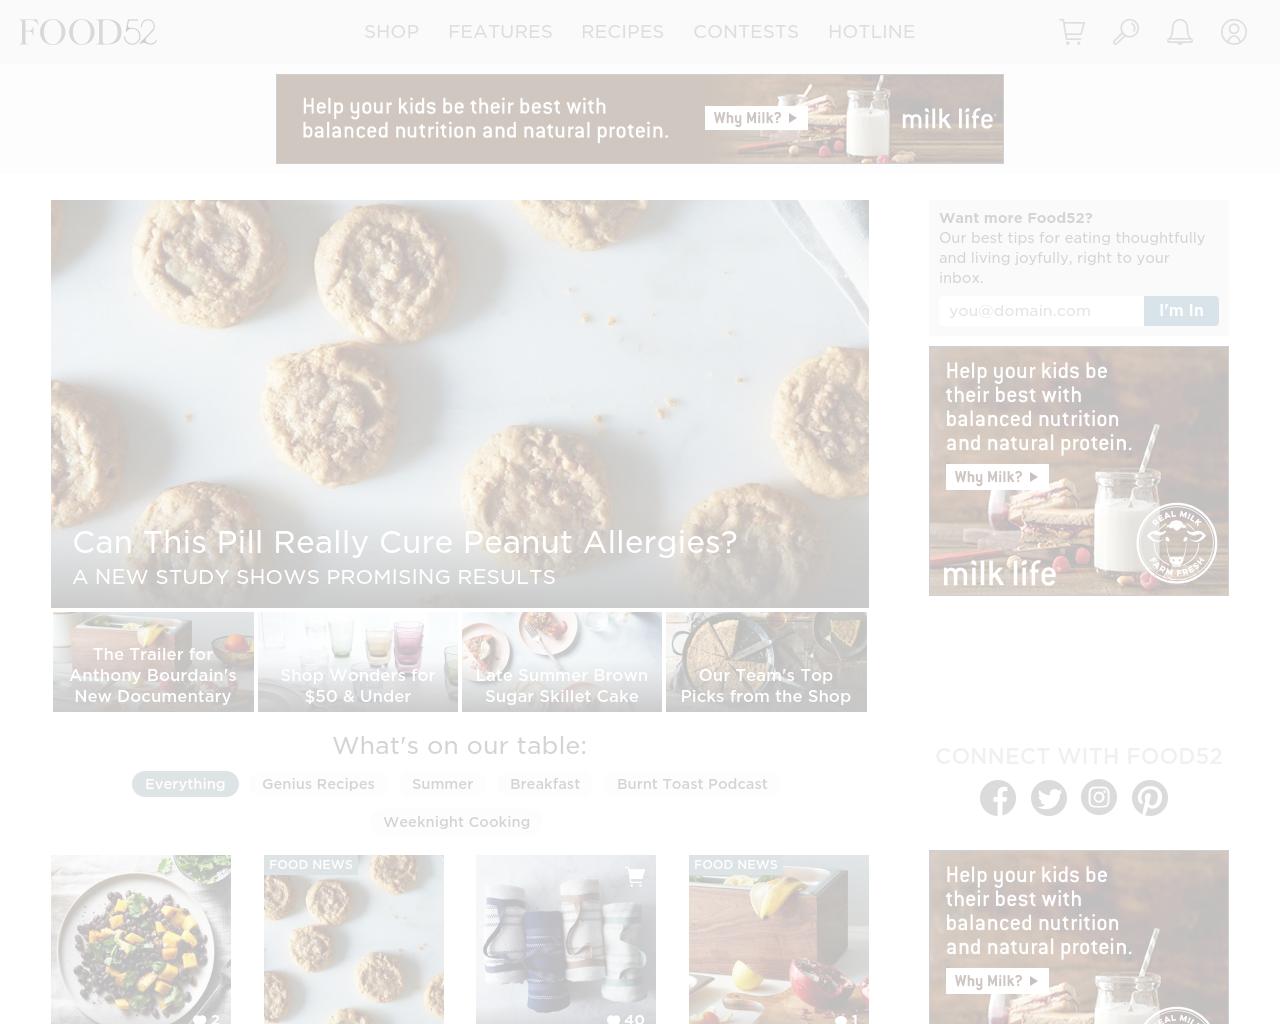 Food52-Advertising-Reviews-Pricing